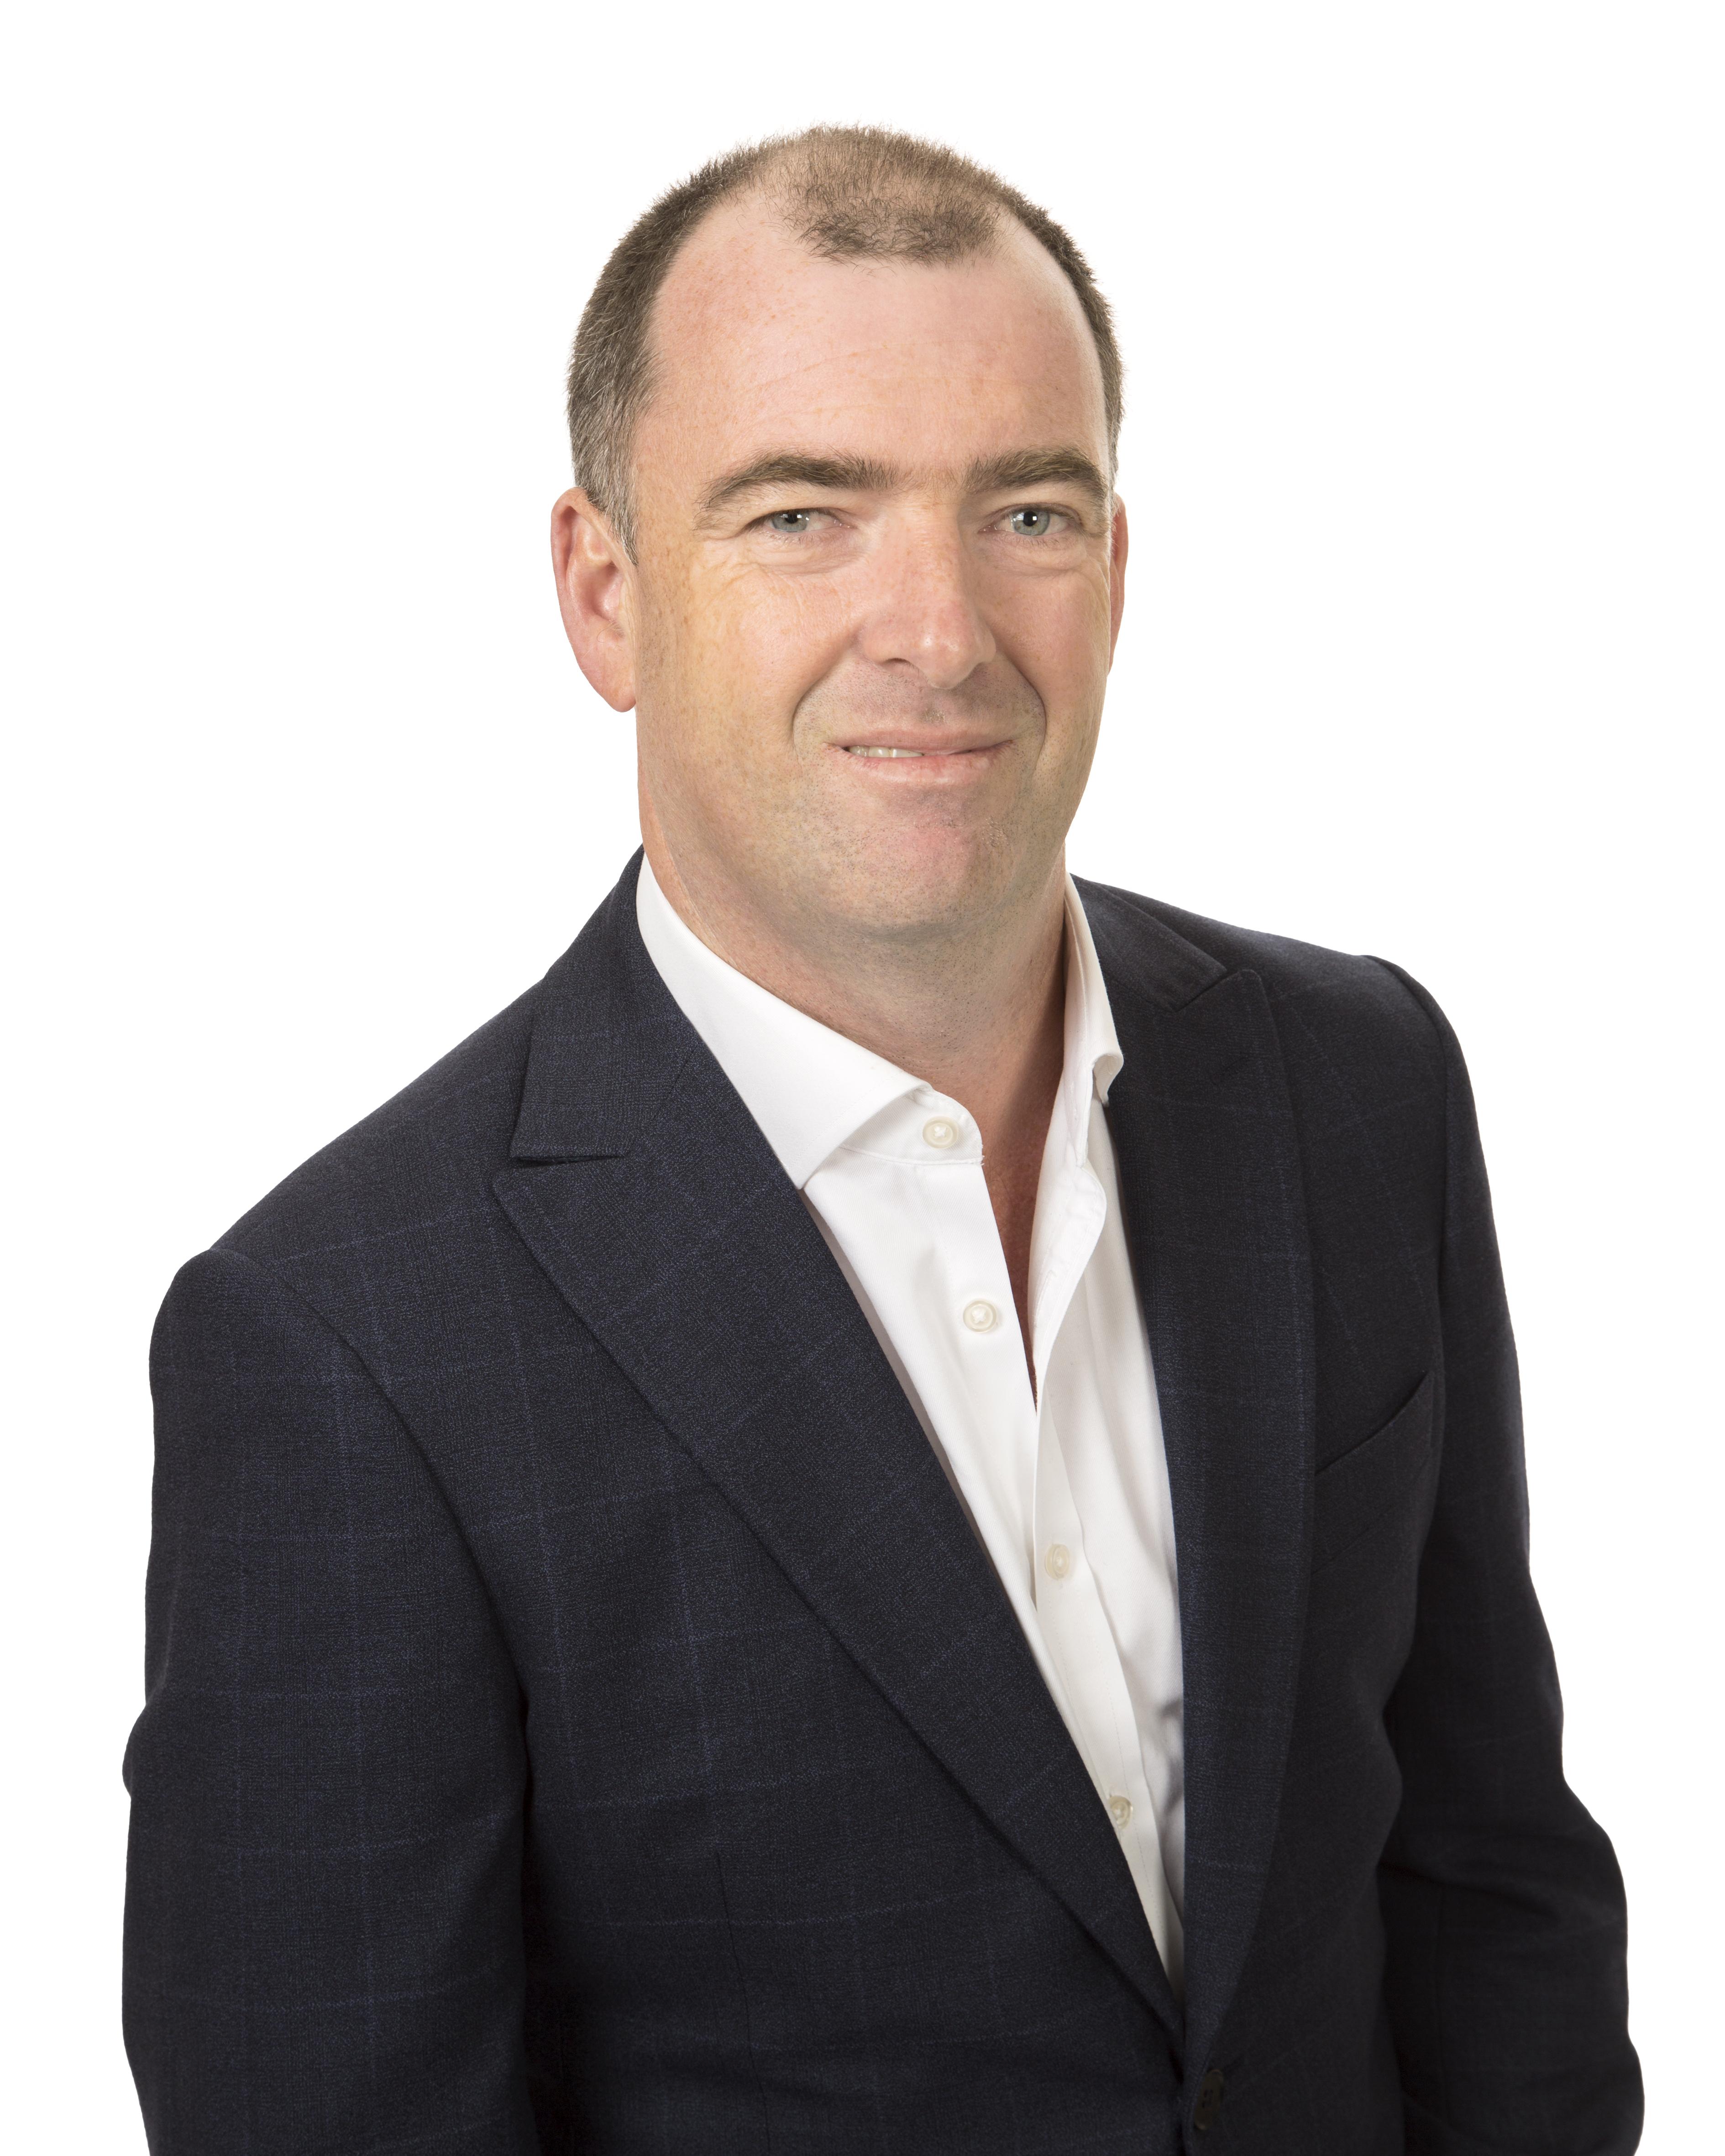 Greg Sleigh